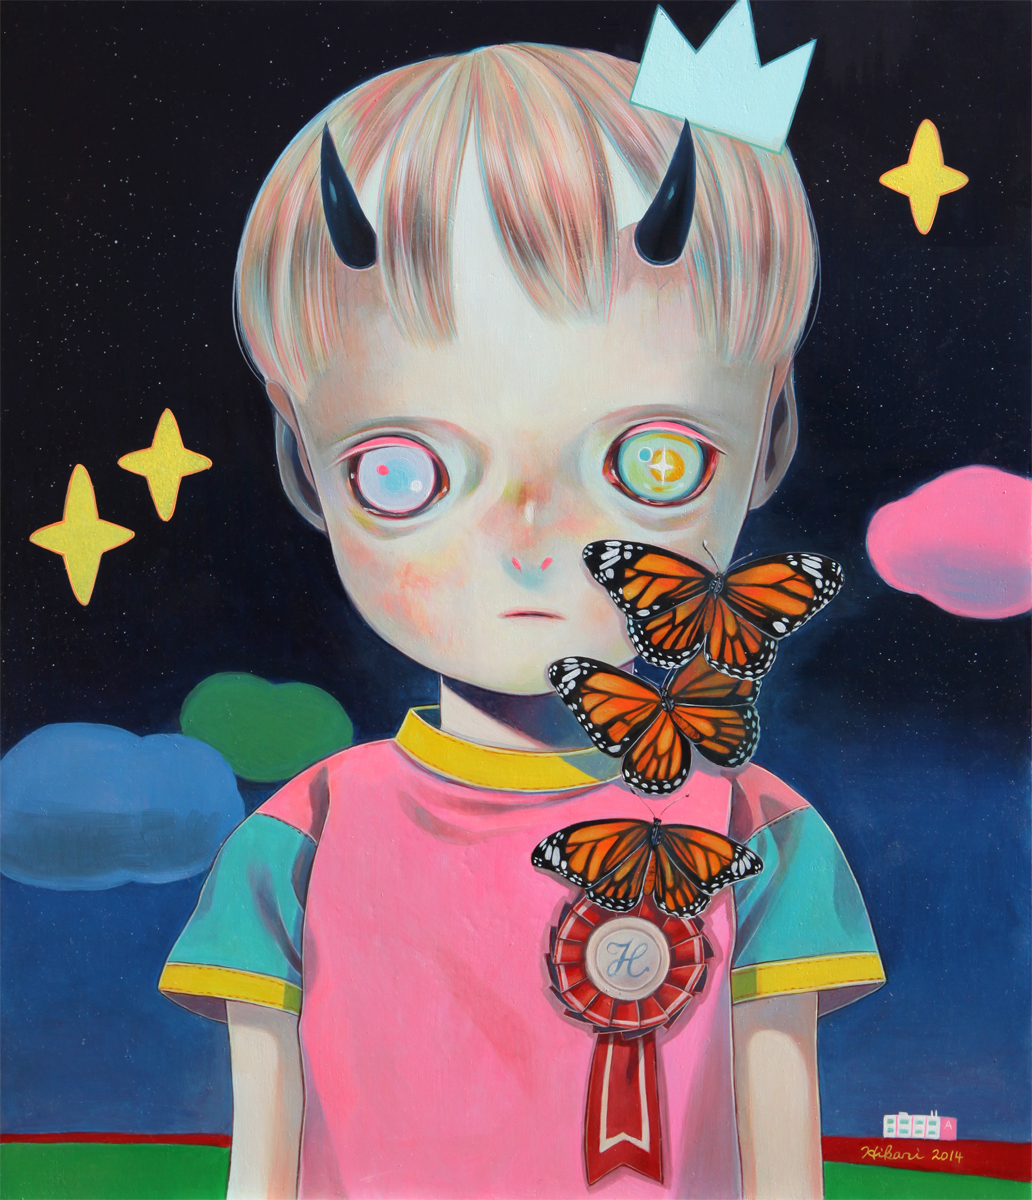 Hikari Shimoda 'Children of This Planet #24' (oil on canvas, 21 x 18 inches, 2014).jpg